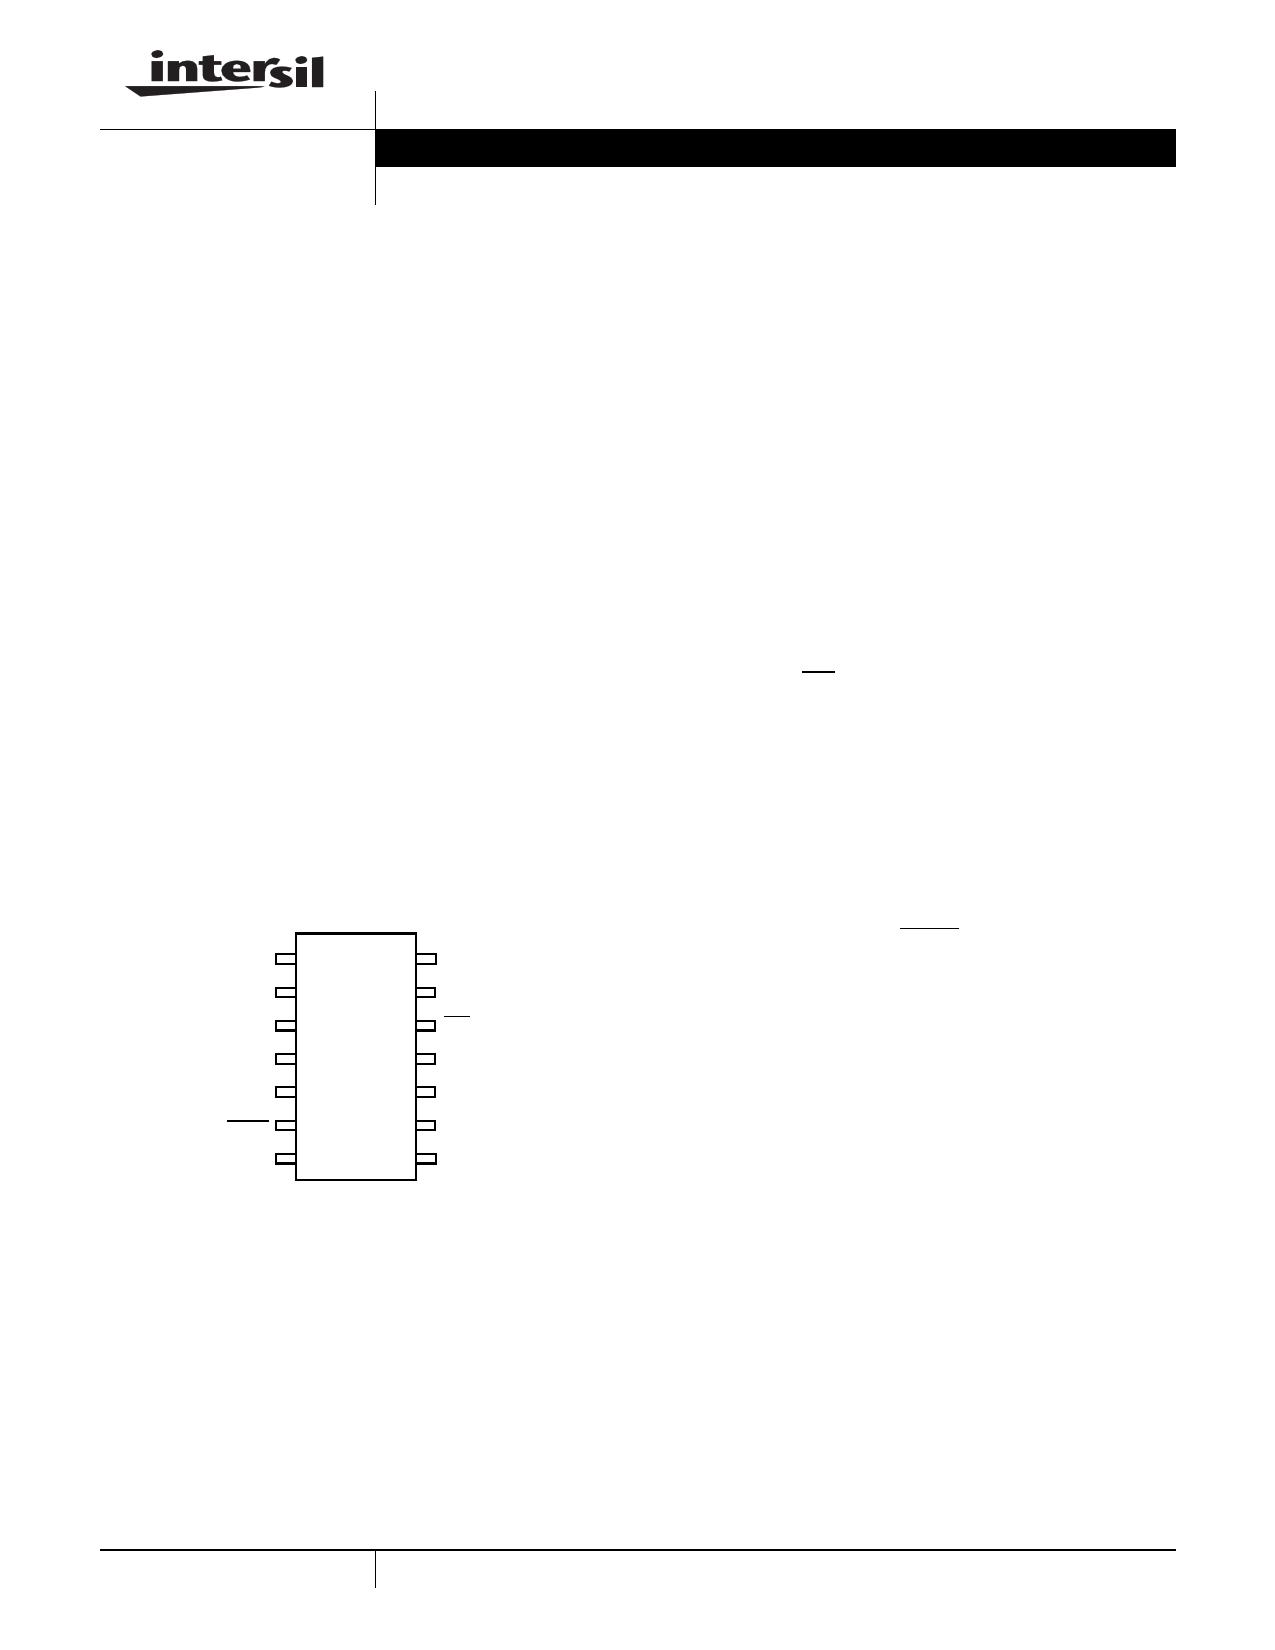 ISL12021 image